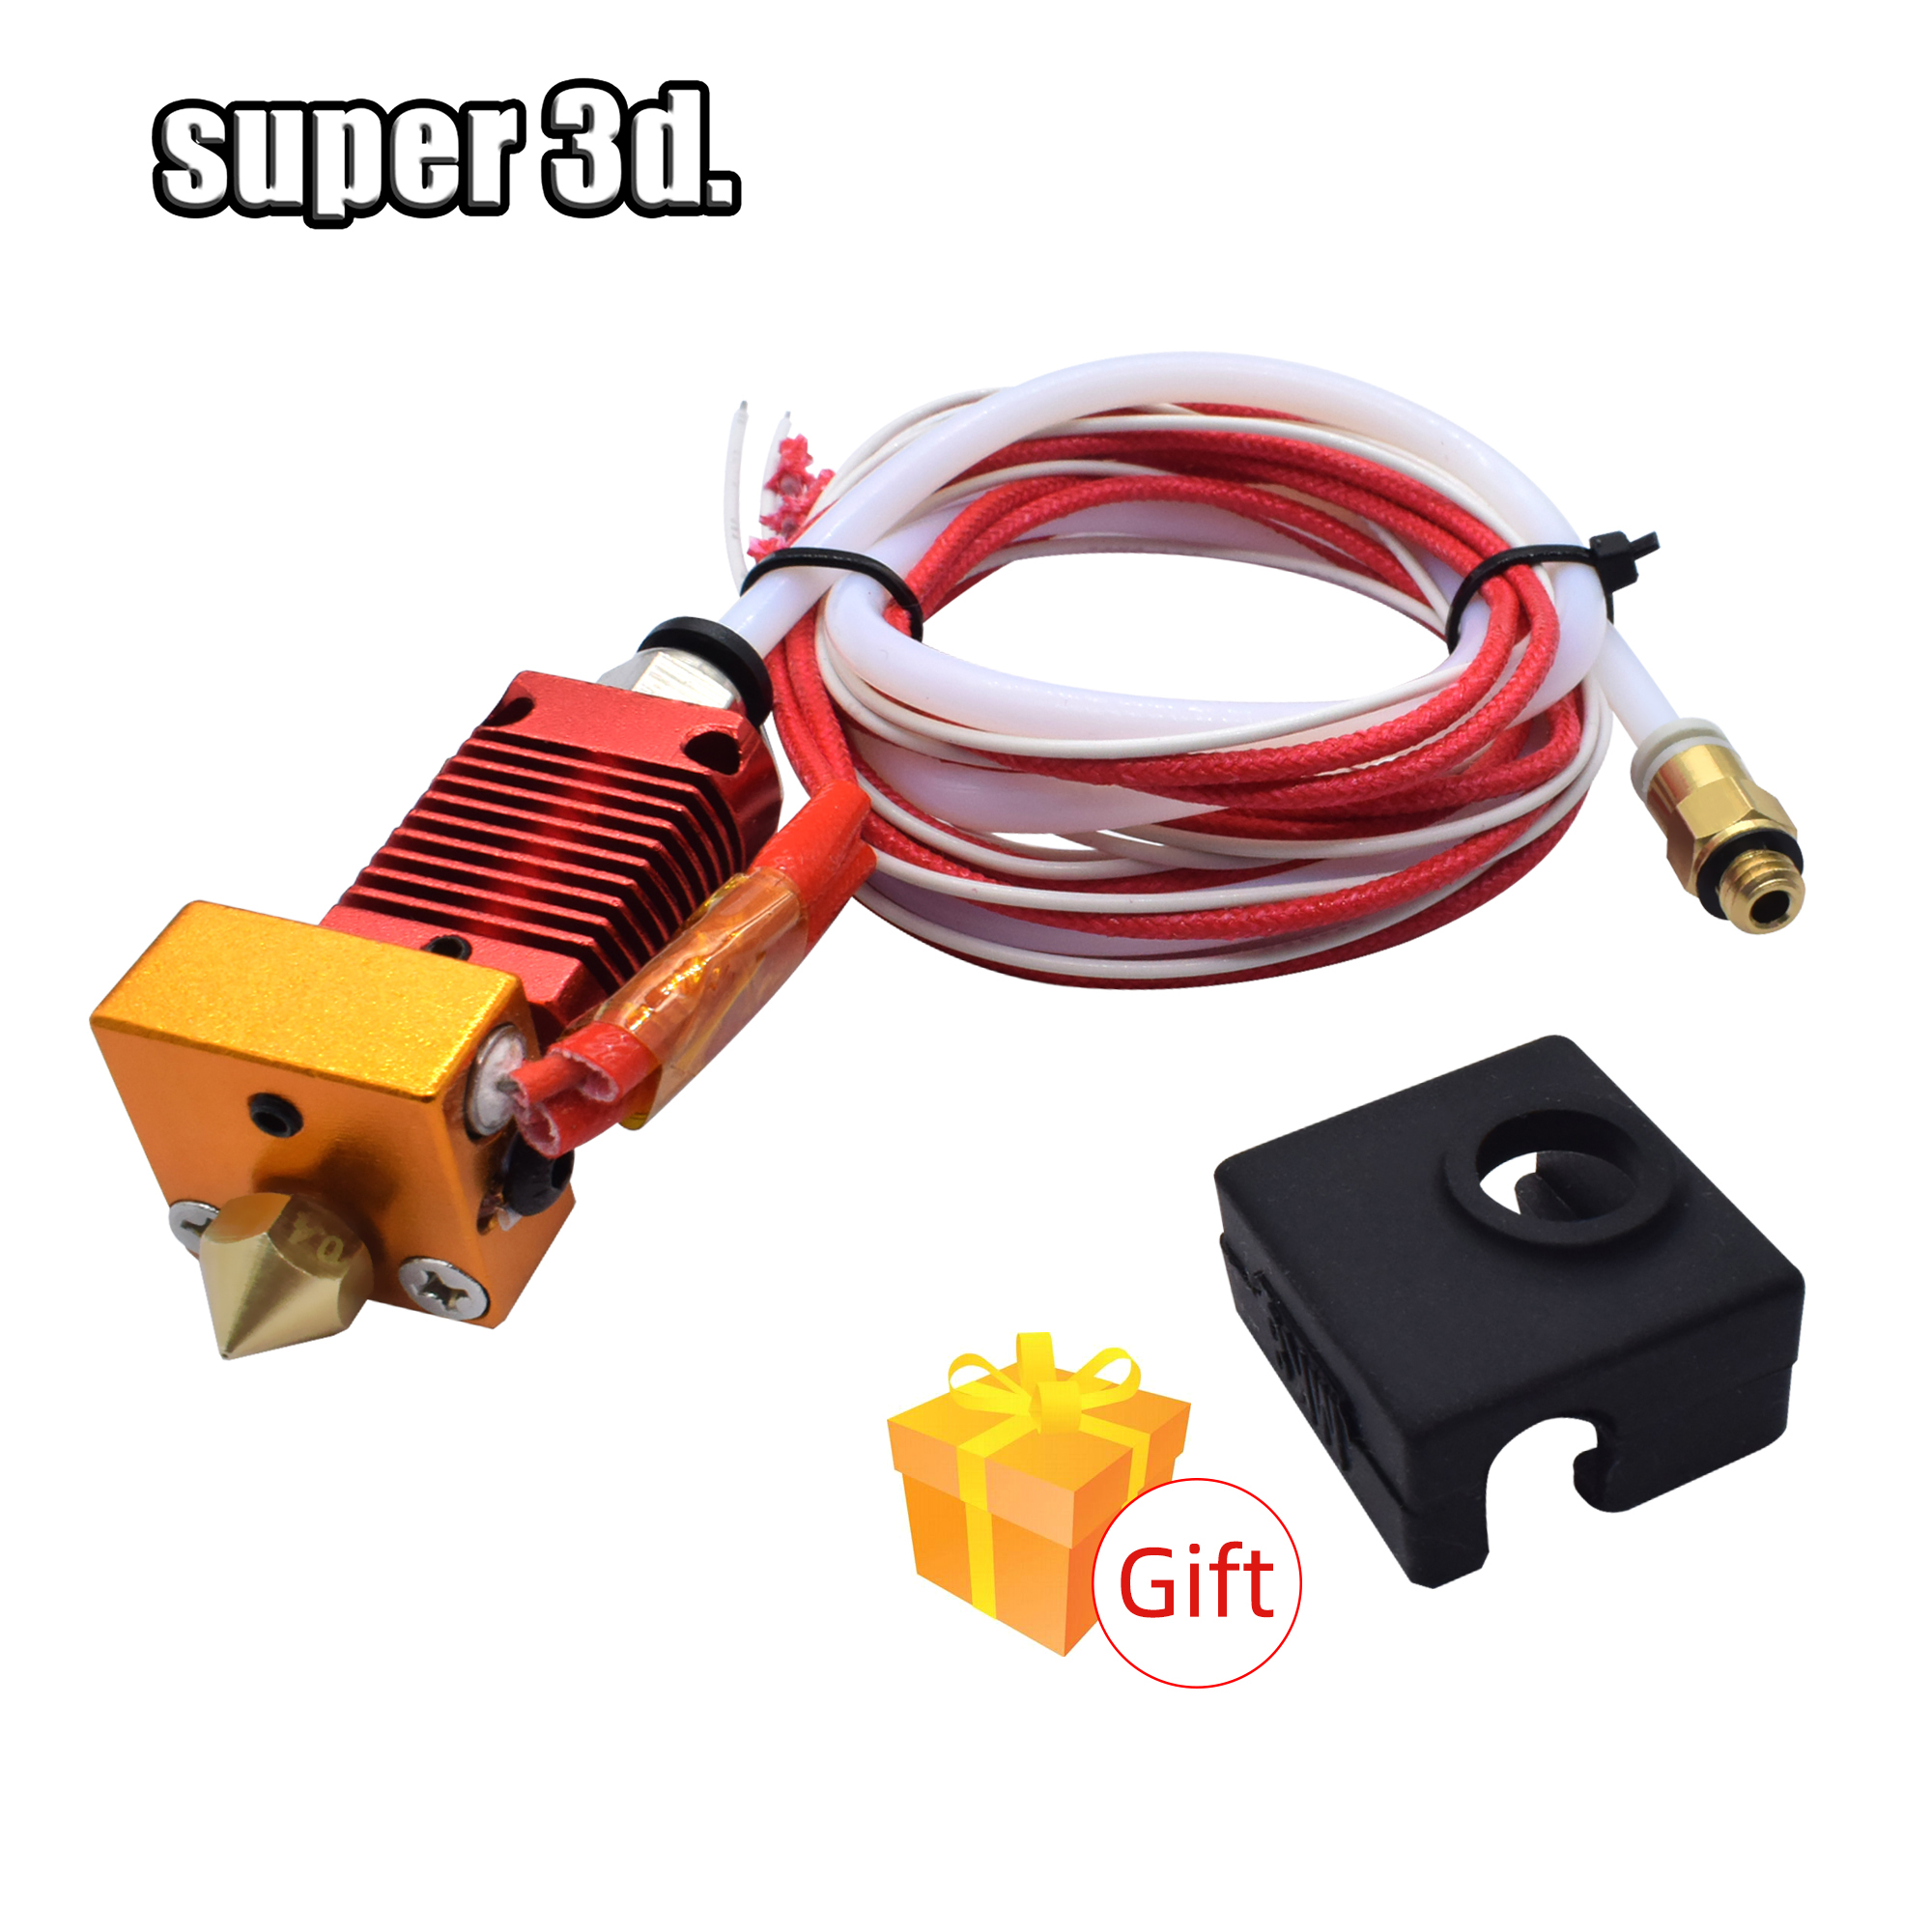 3D Full Metal J-head  CR10 Hotend Extruder Kit Hot End Kit For Ender-3 CR10 10s Bowden Extruder 12/24V 40W 3D Printer Parts